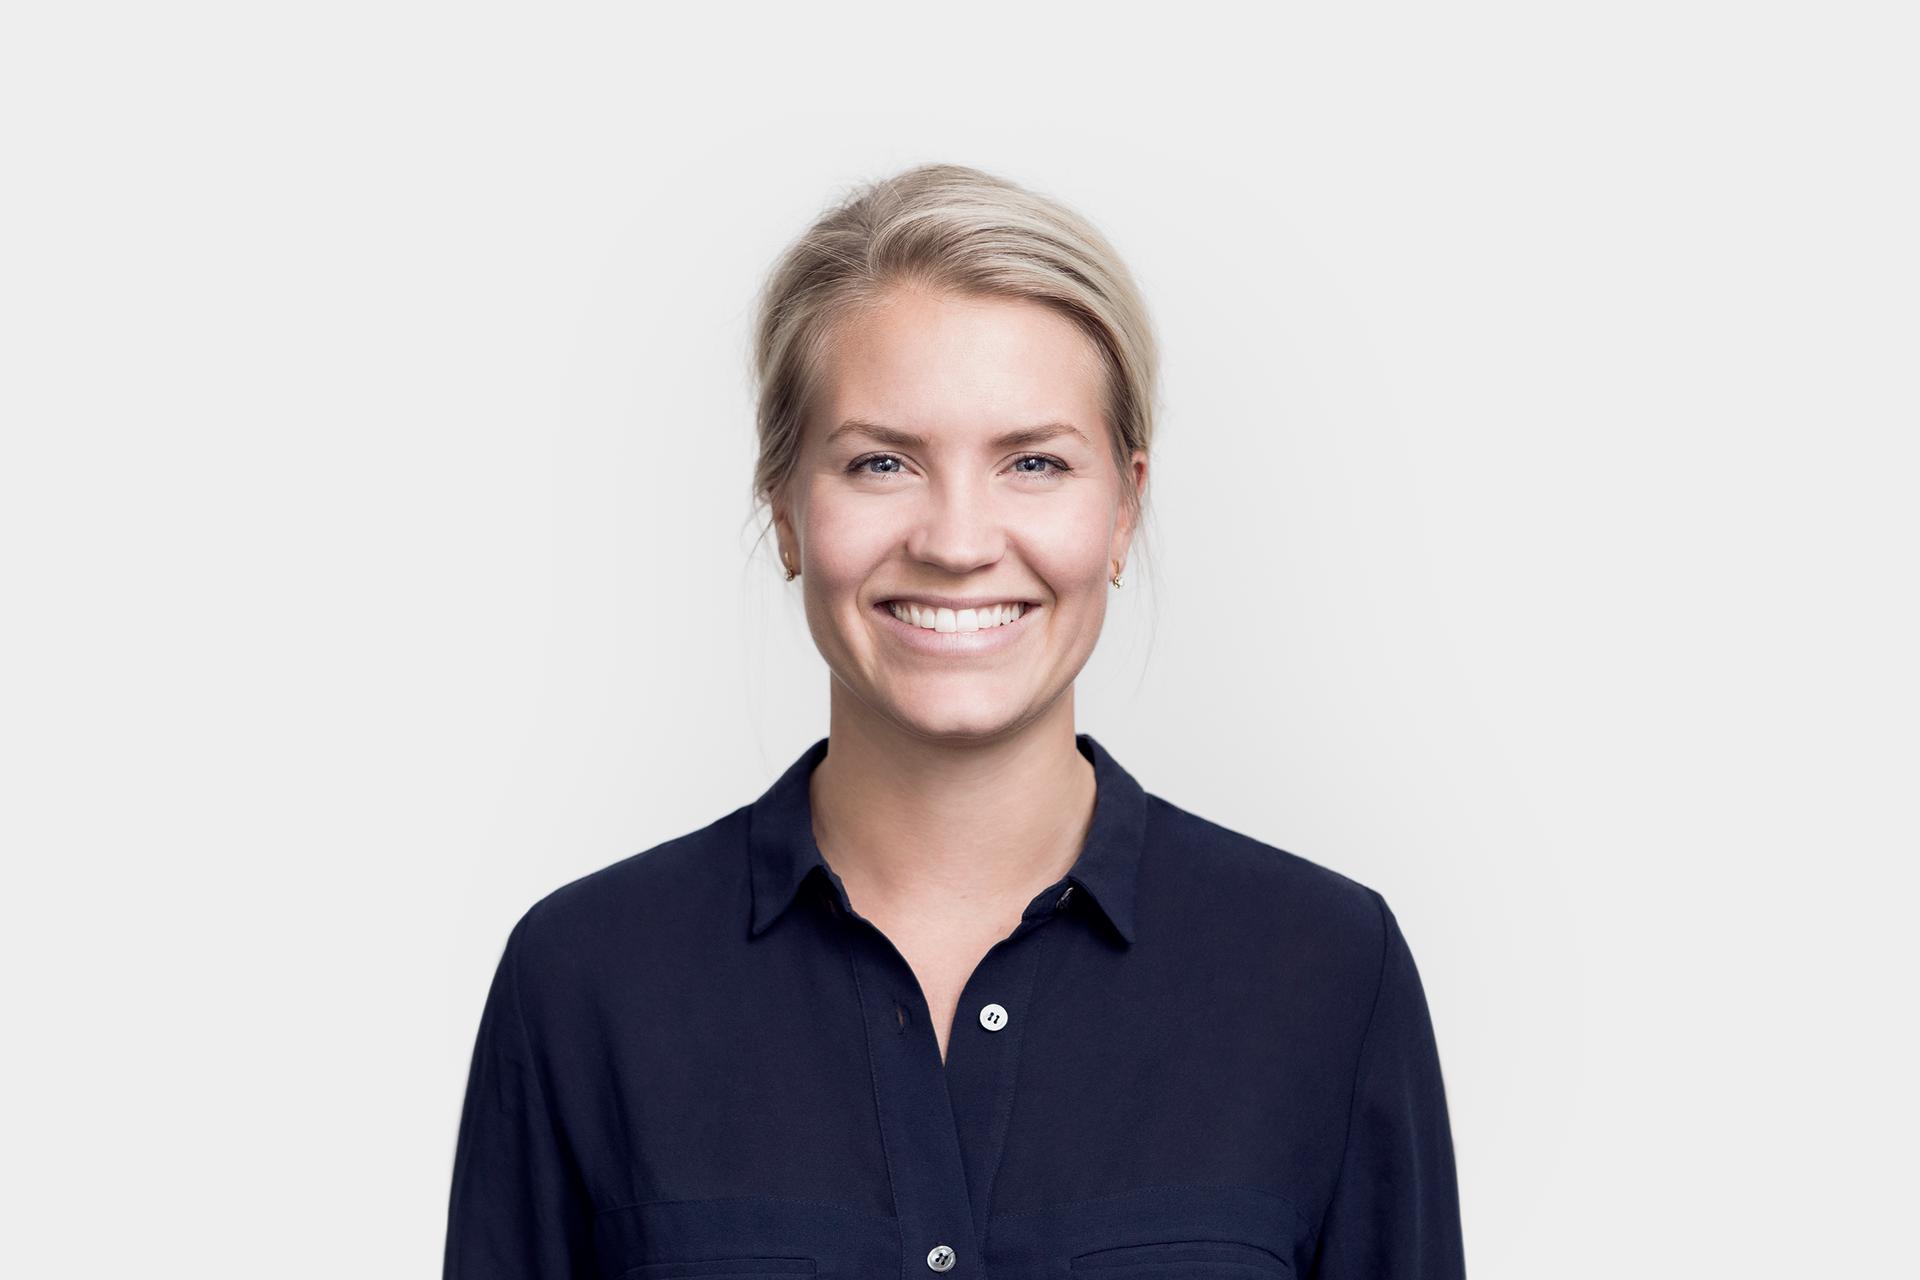 Martina Klingvall CEO & co-founder Telness.se